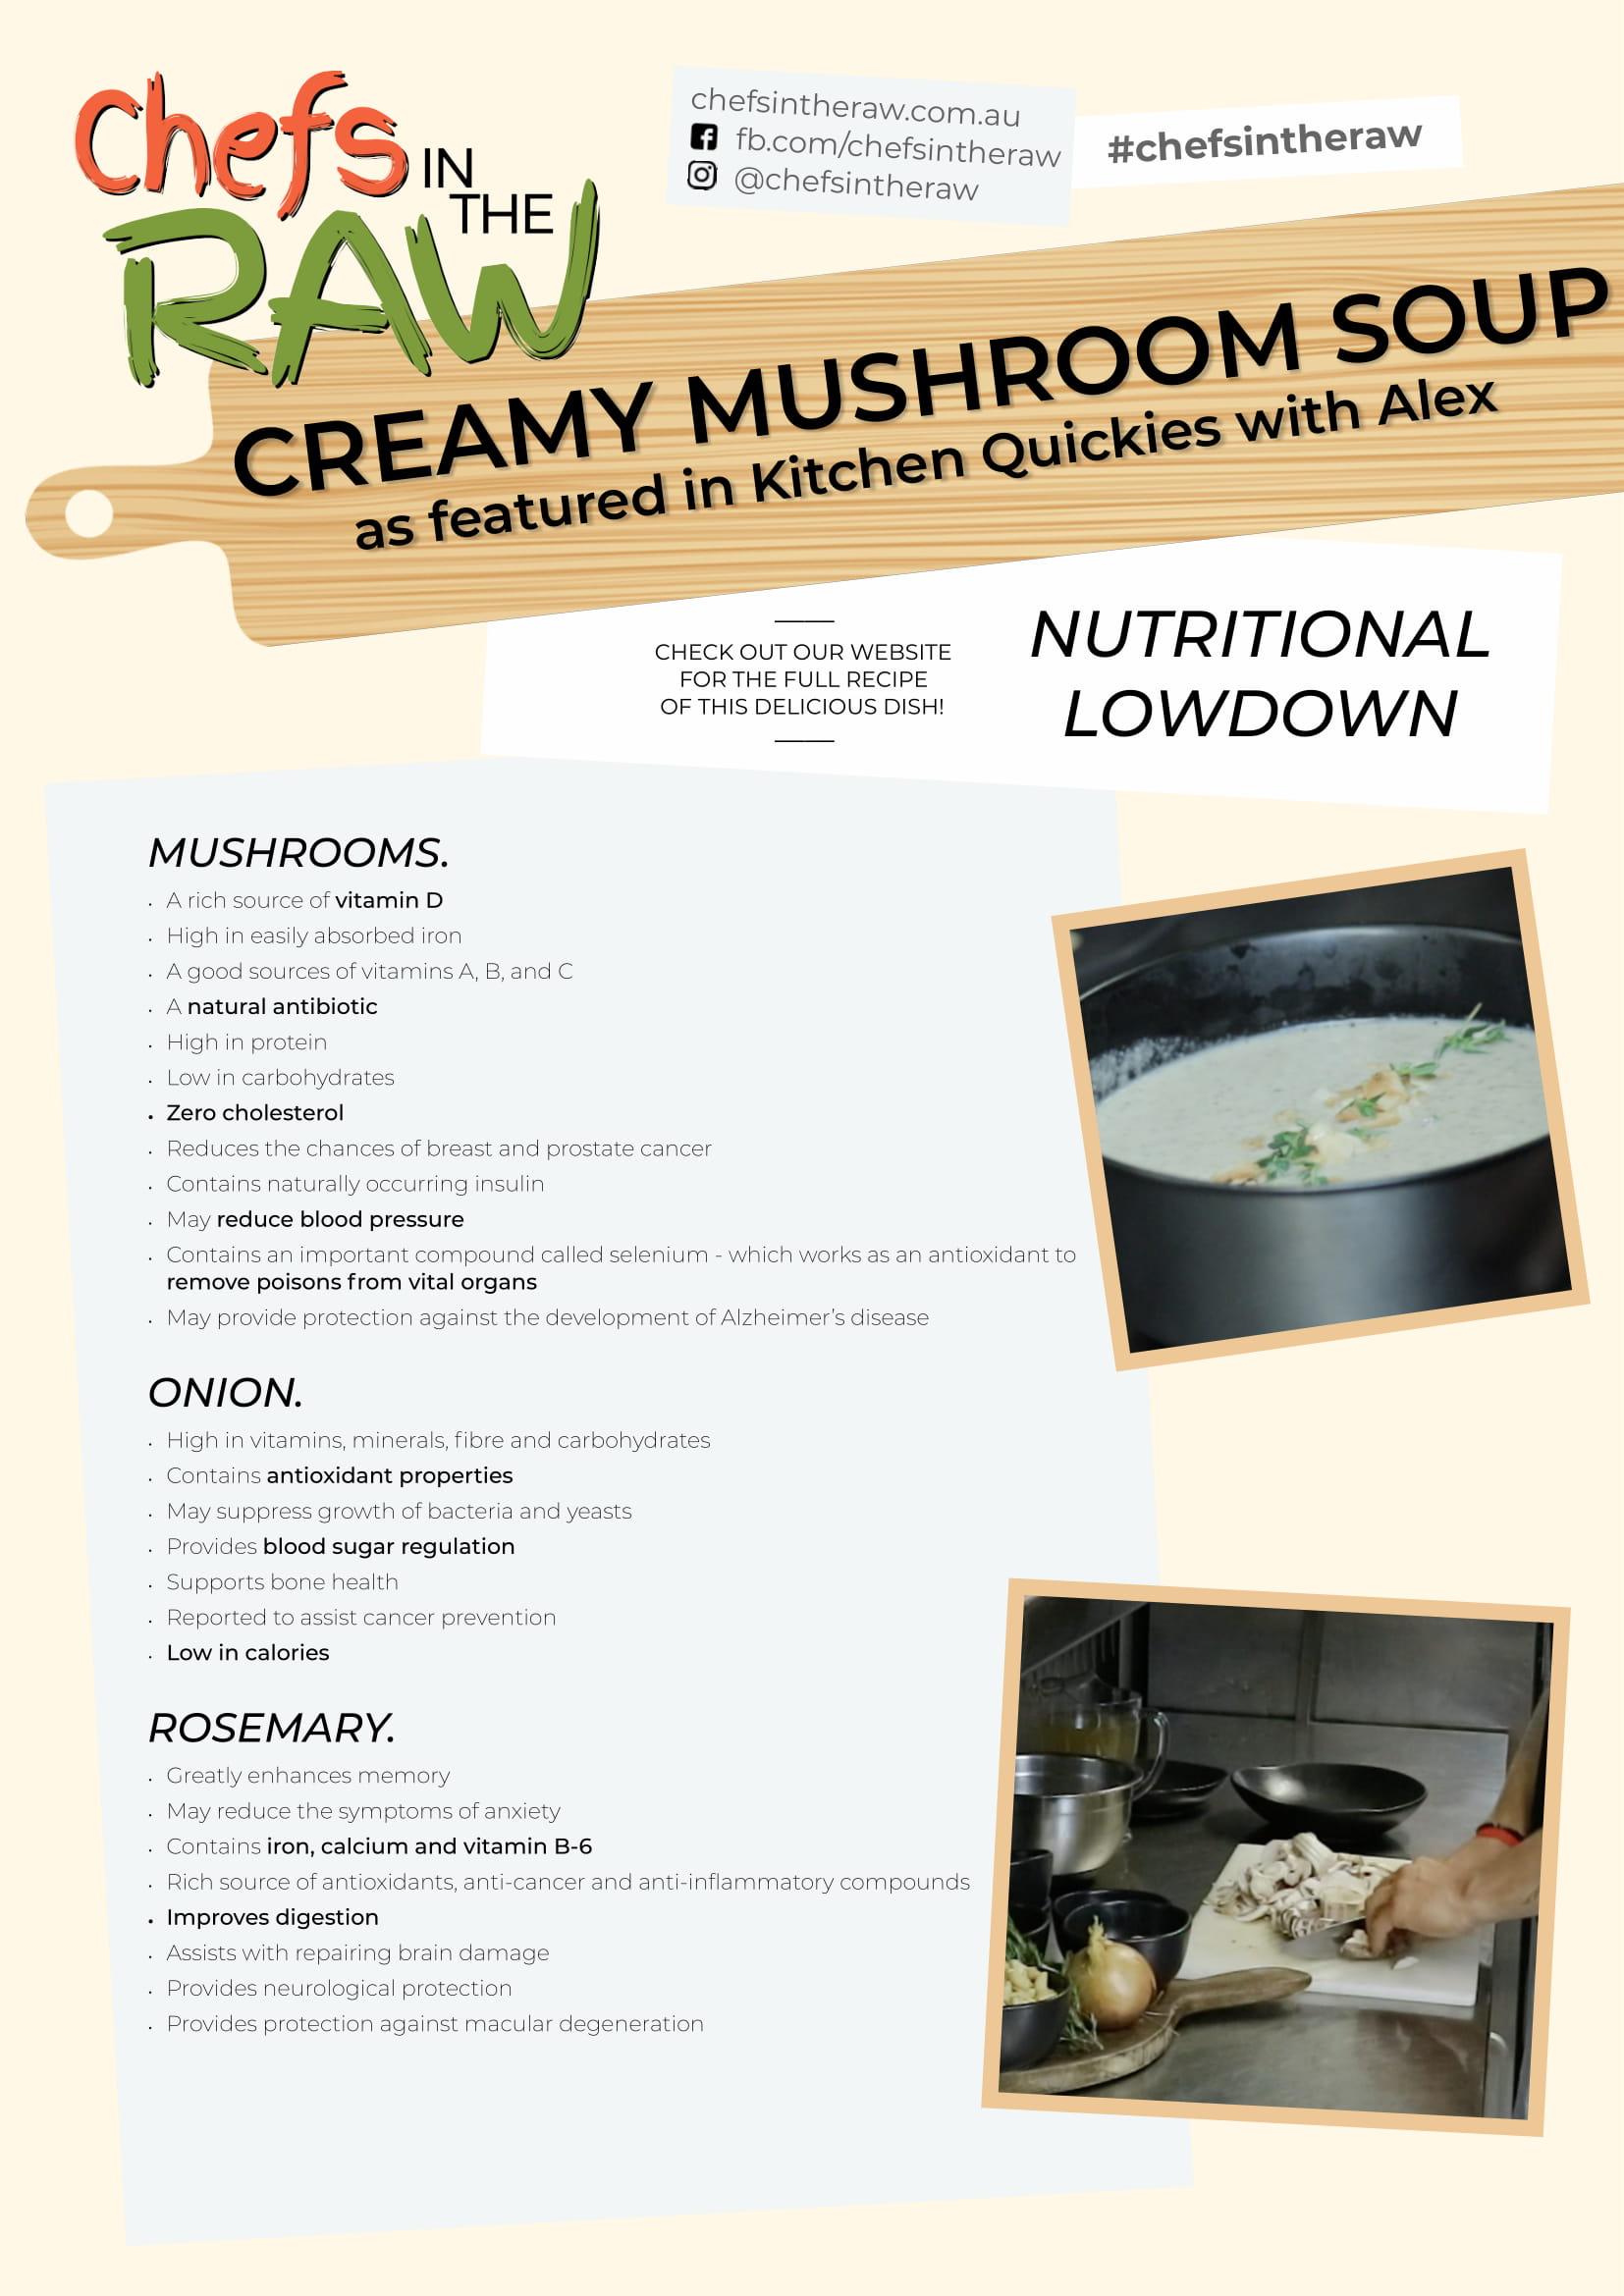 nutrition_creamymushroomsoup-1.jpg